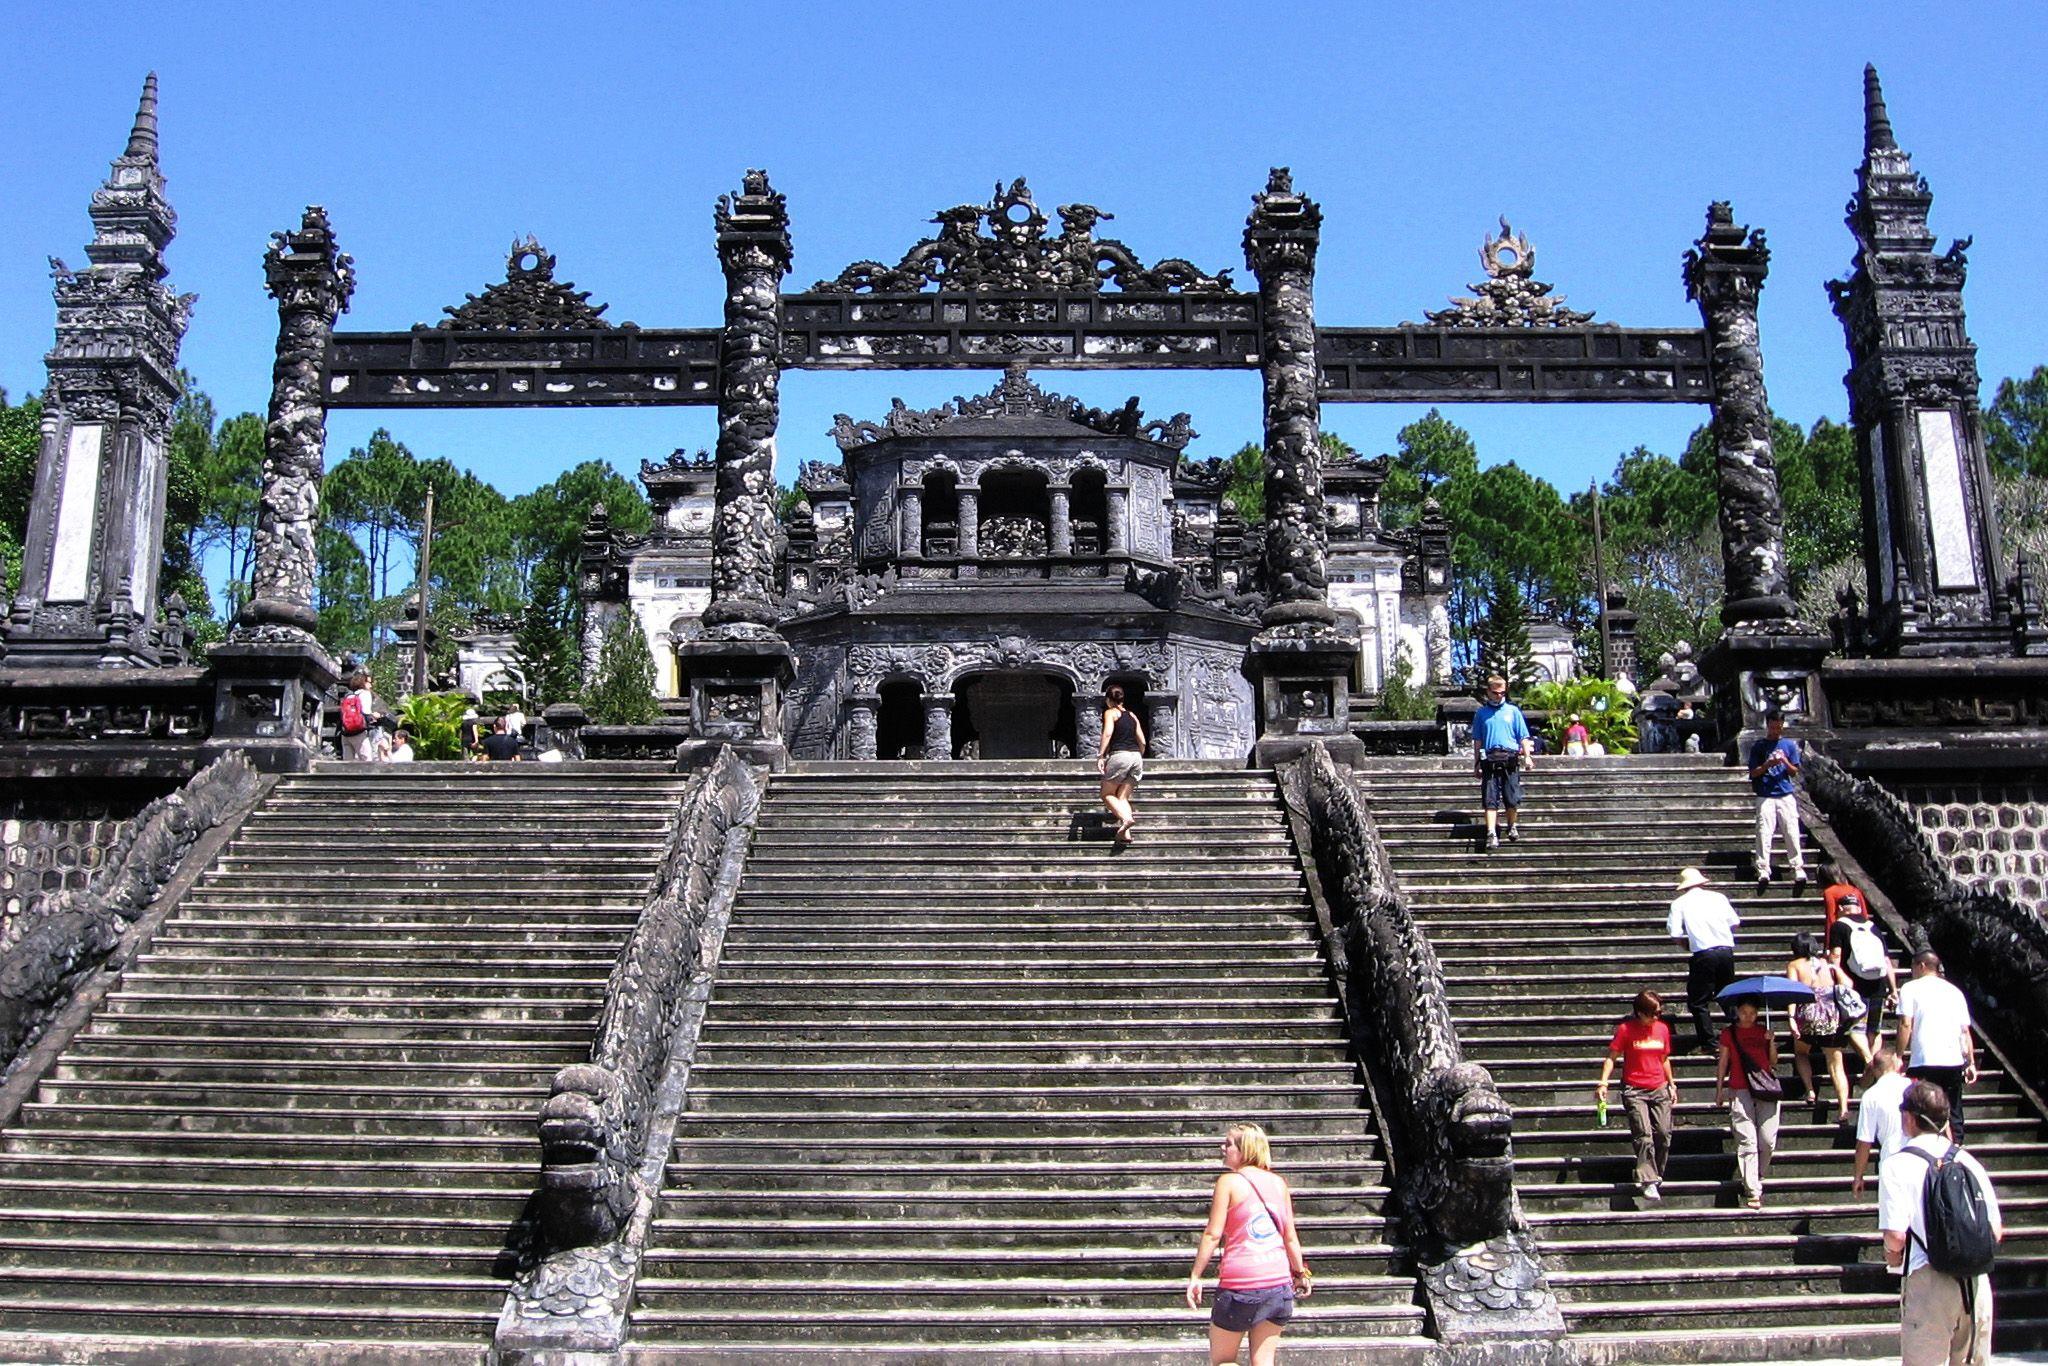 Steps leading up to forecourt, Khai Dinh Royal Tomb, Hue, Vietnam.